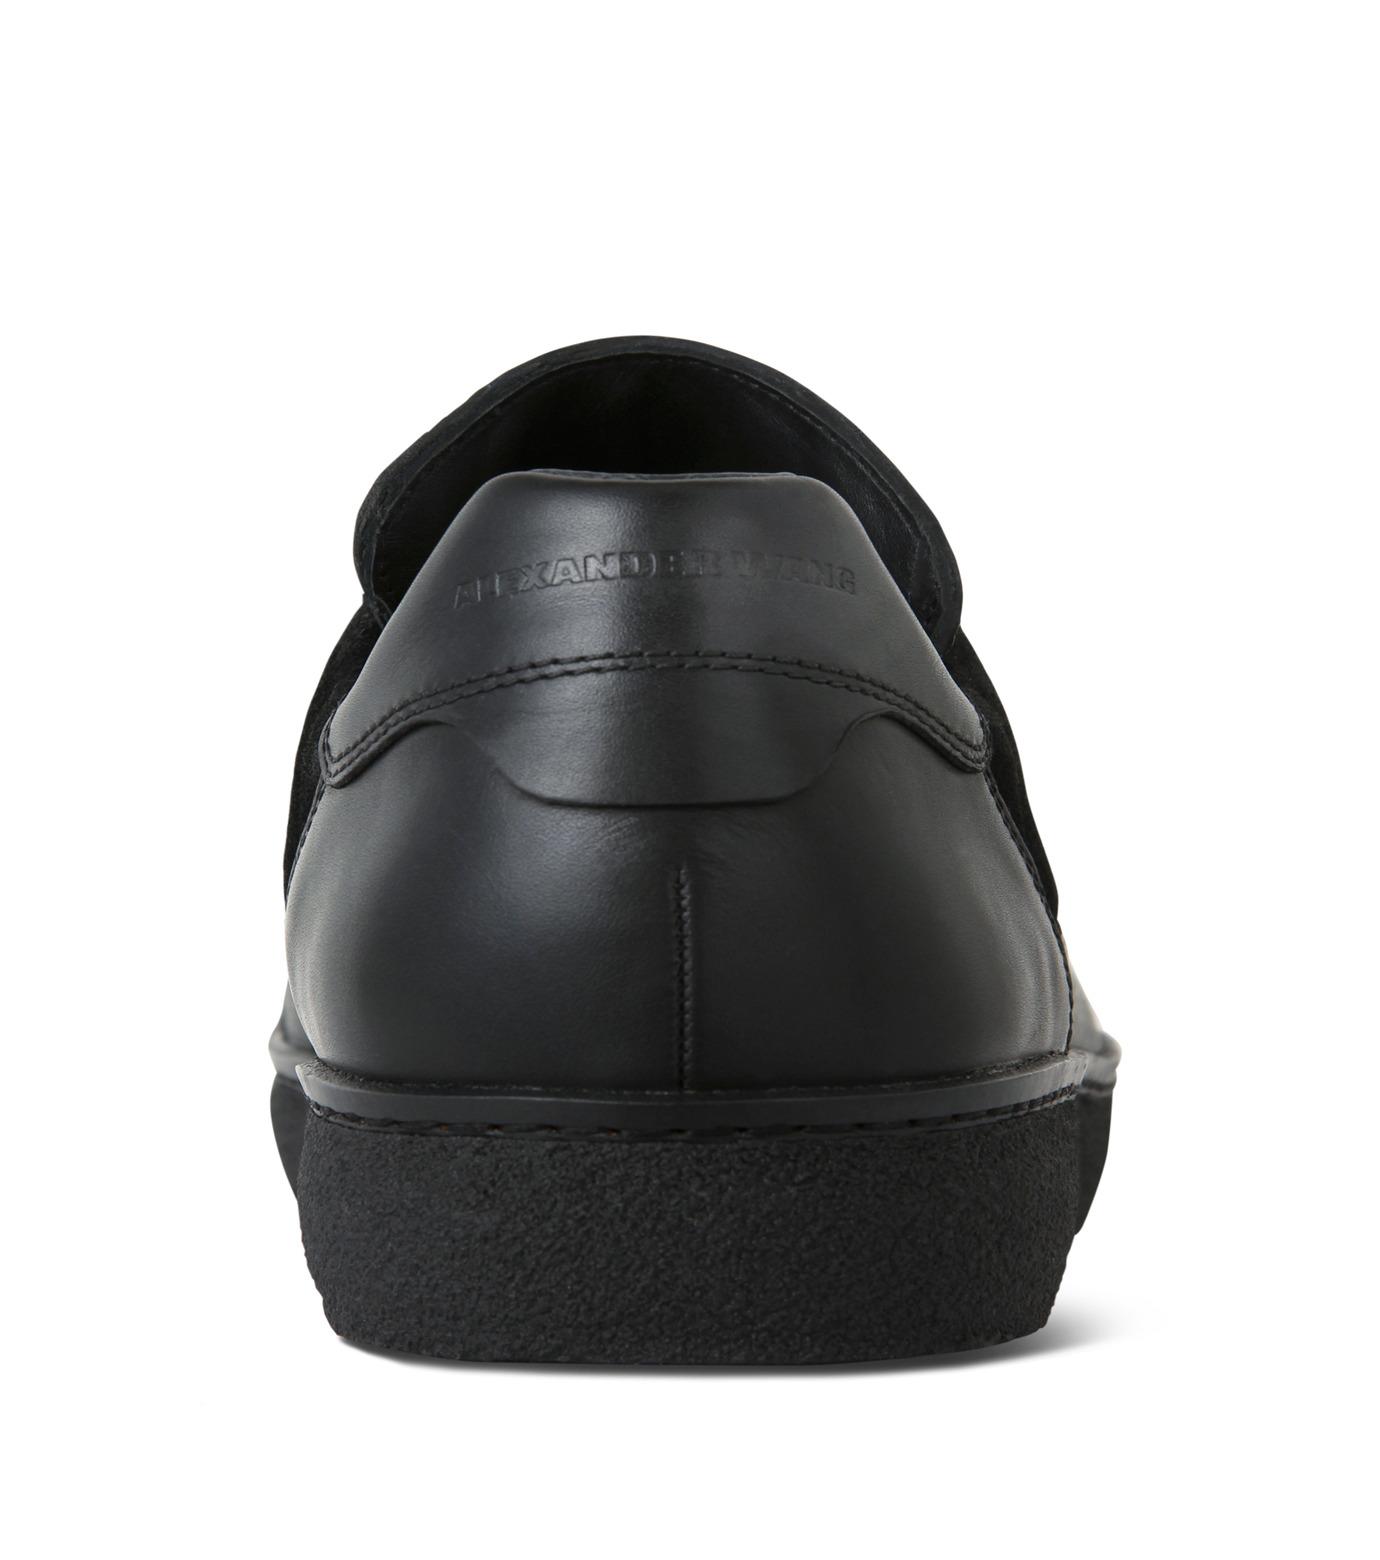 Alexander Wang(アレキサンダーワン)のEden Low-BLACK(シューズ/shoes)-311103S16-13 拡大詳細画像2